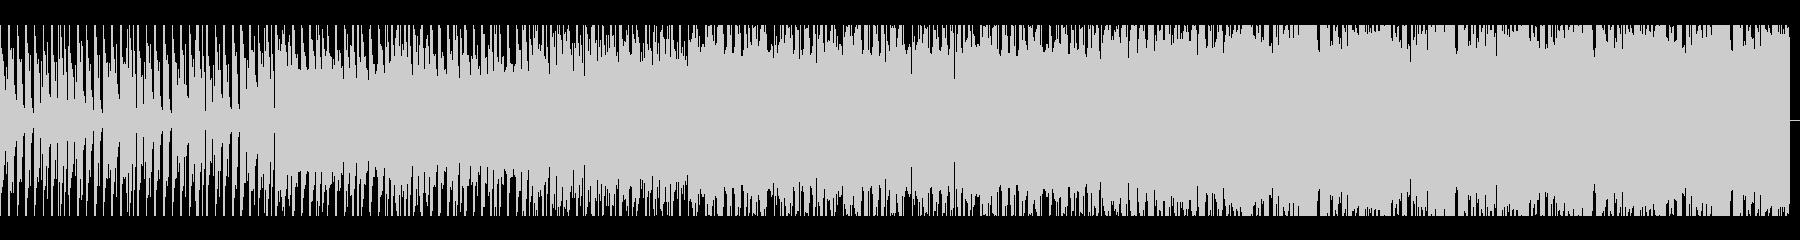 EDM K-POP フューチャーベースの未再生の波形